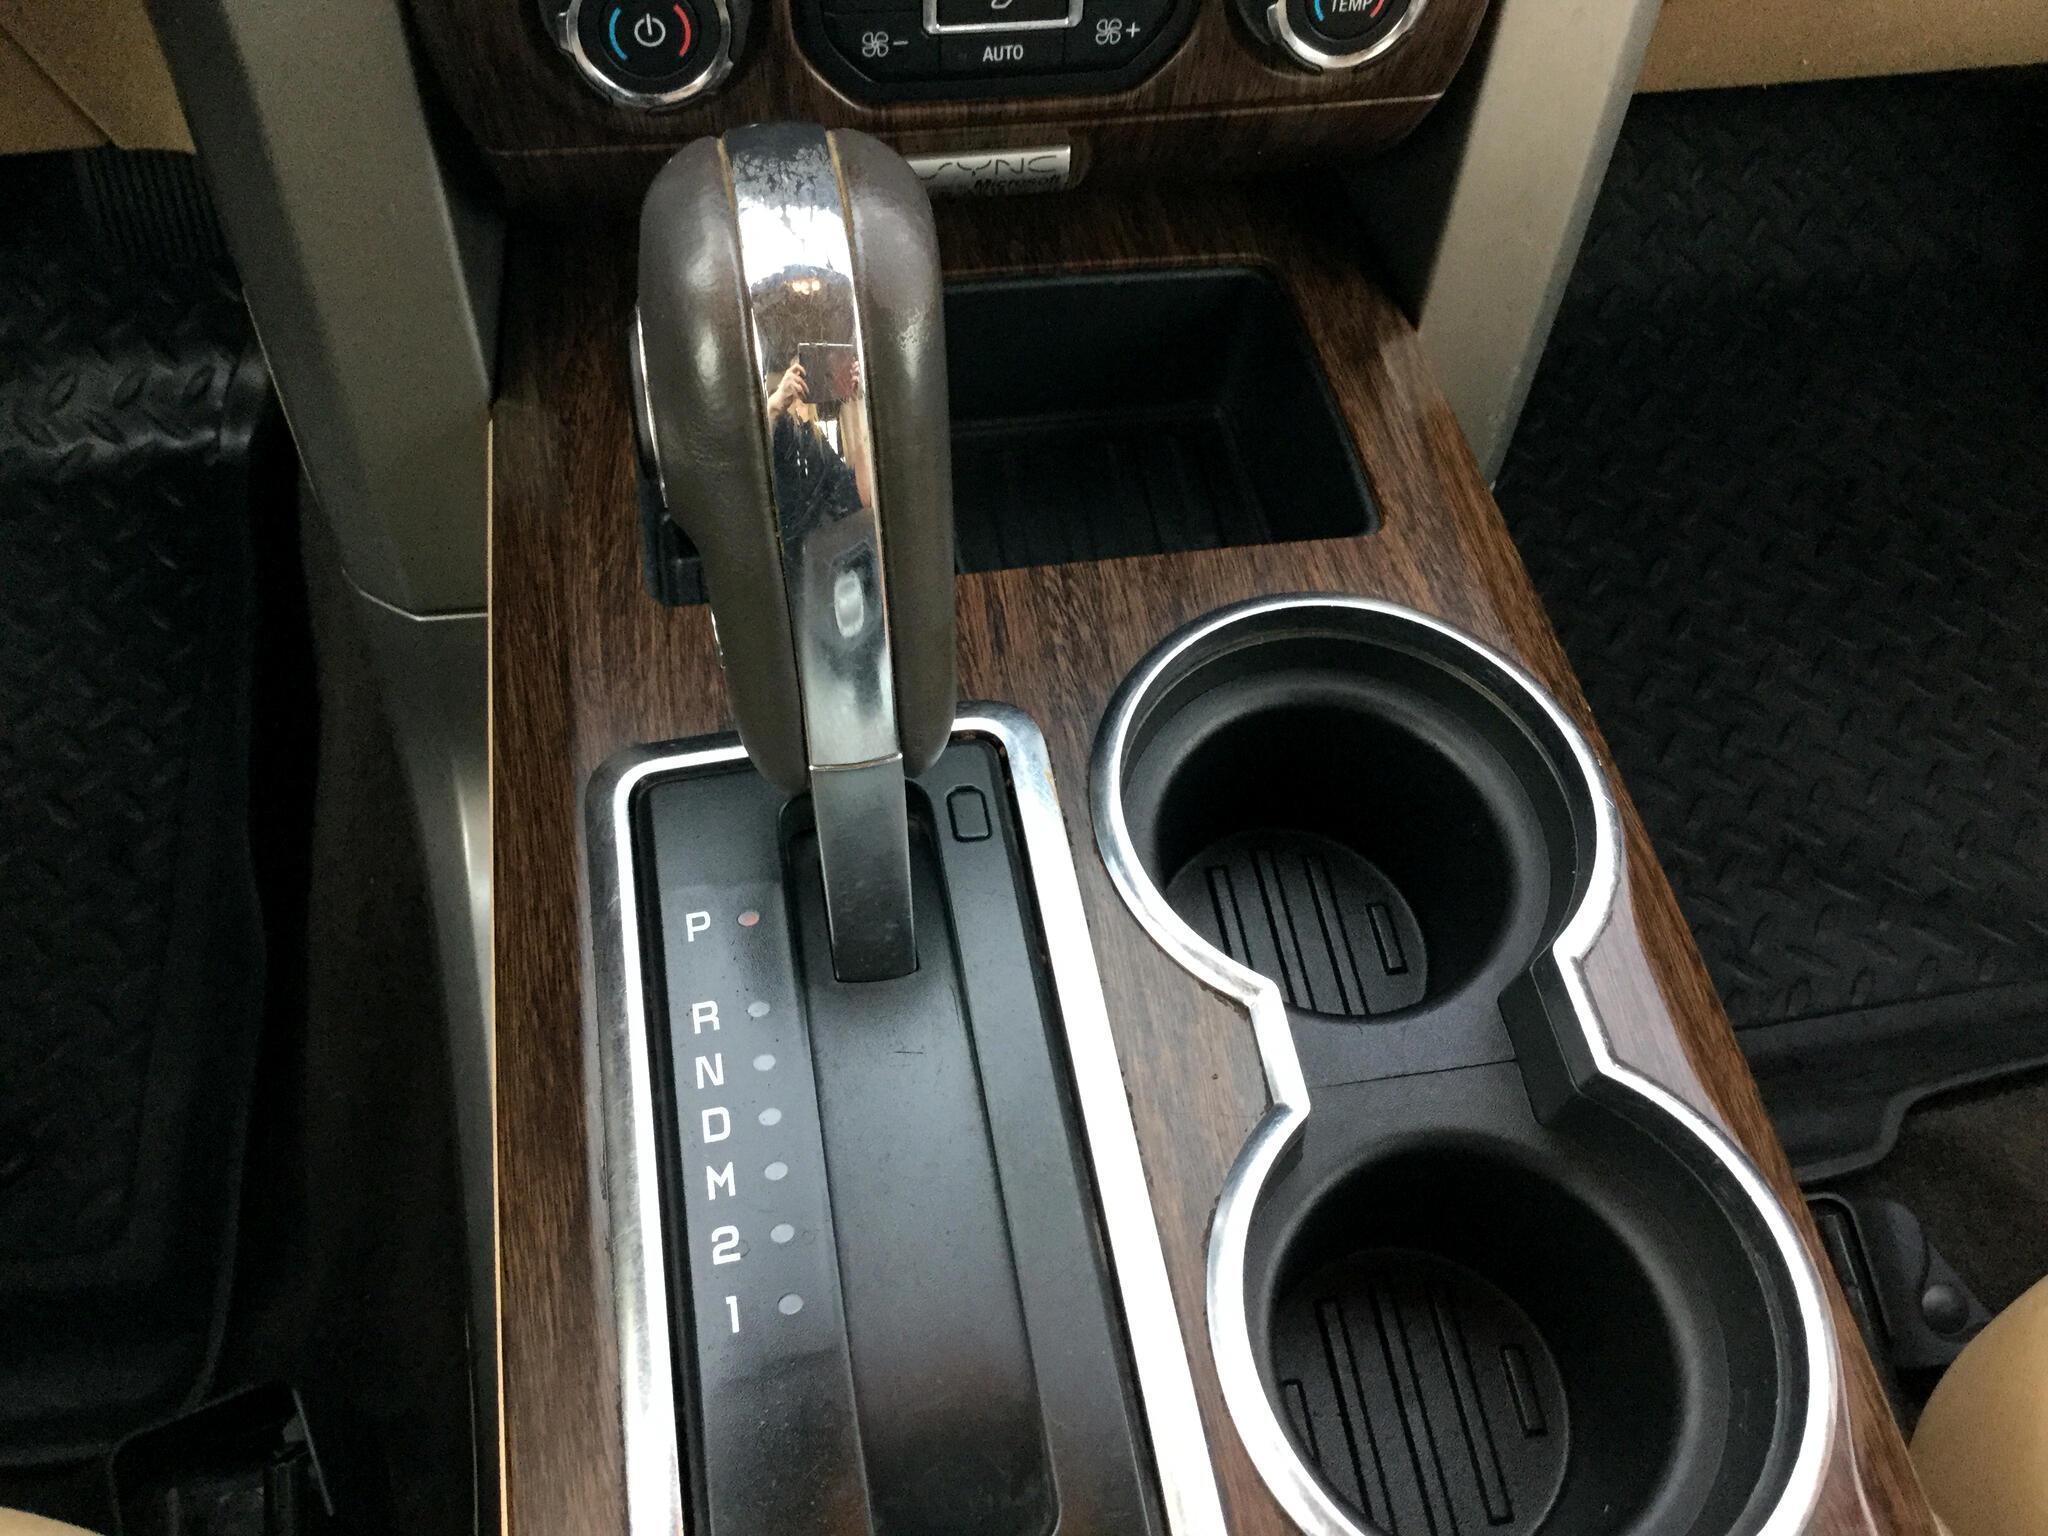 2014 Ford F-150 4WD SuperCrew Lariat 3.5L Ecoboost